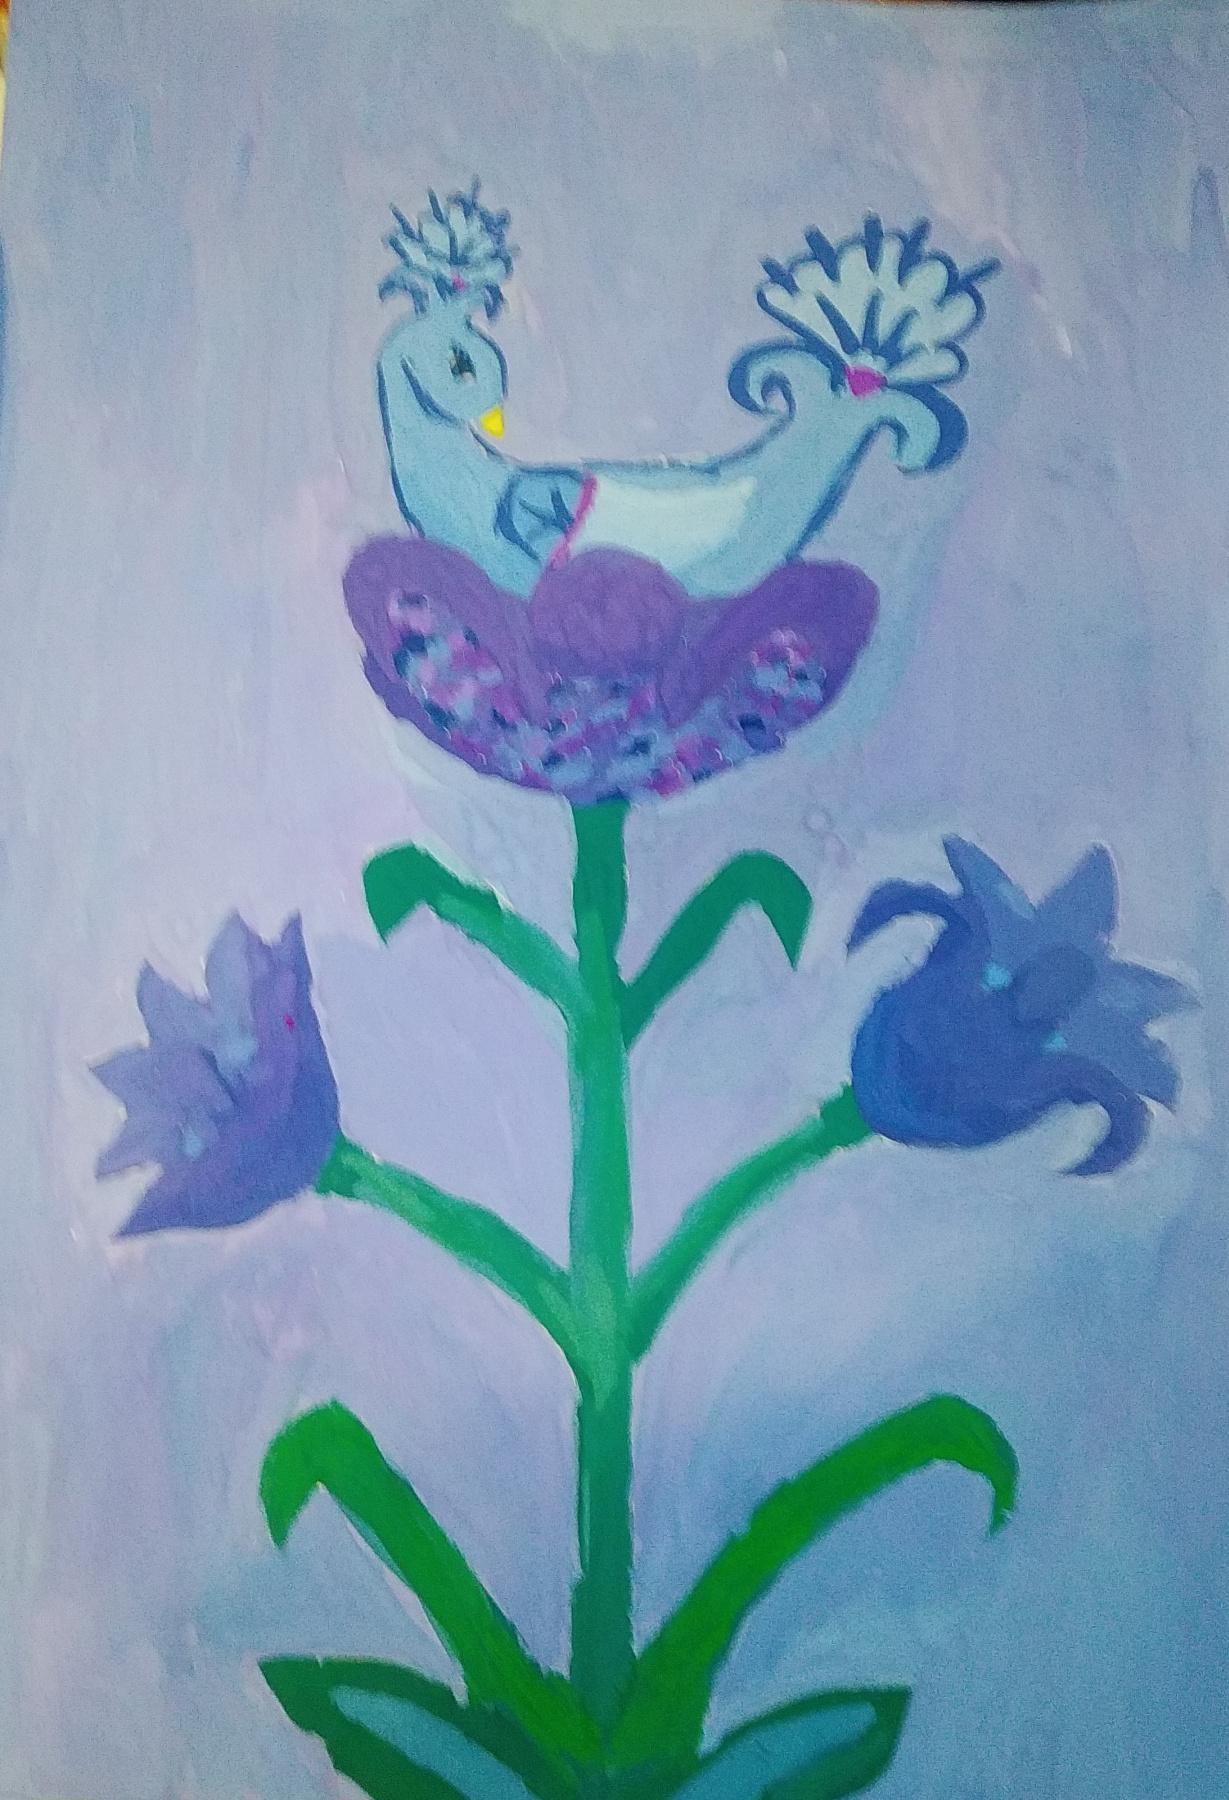 Zina Vladimirovna Parisva. Birds of happiness